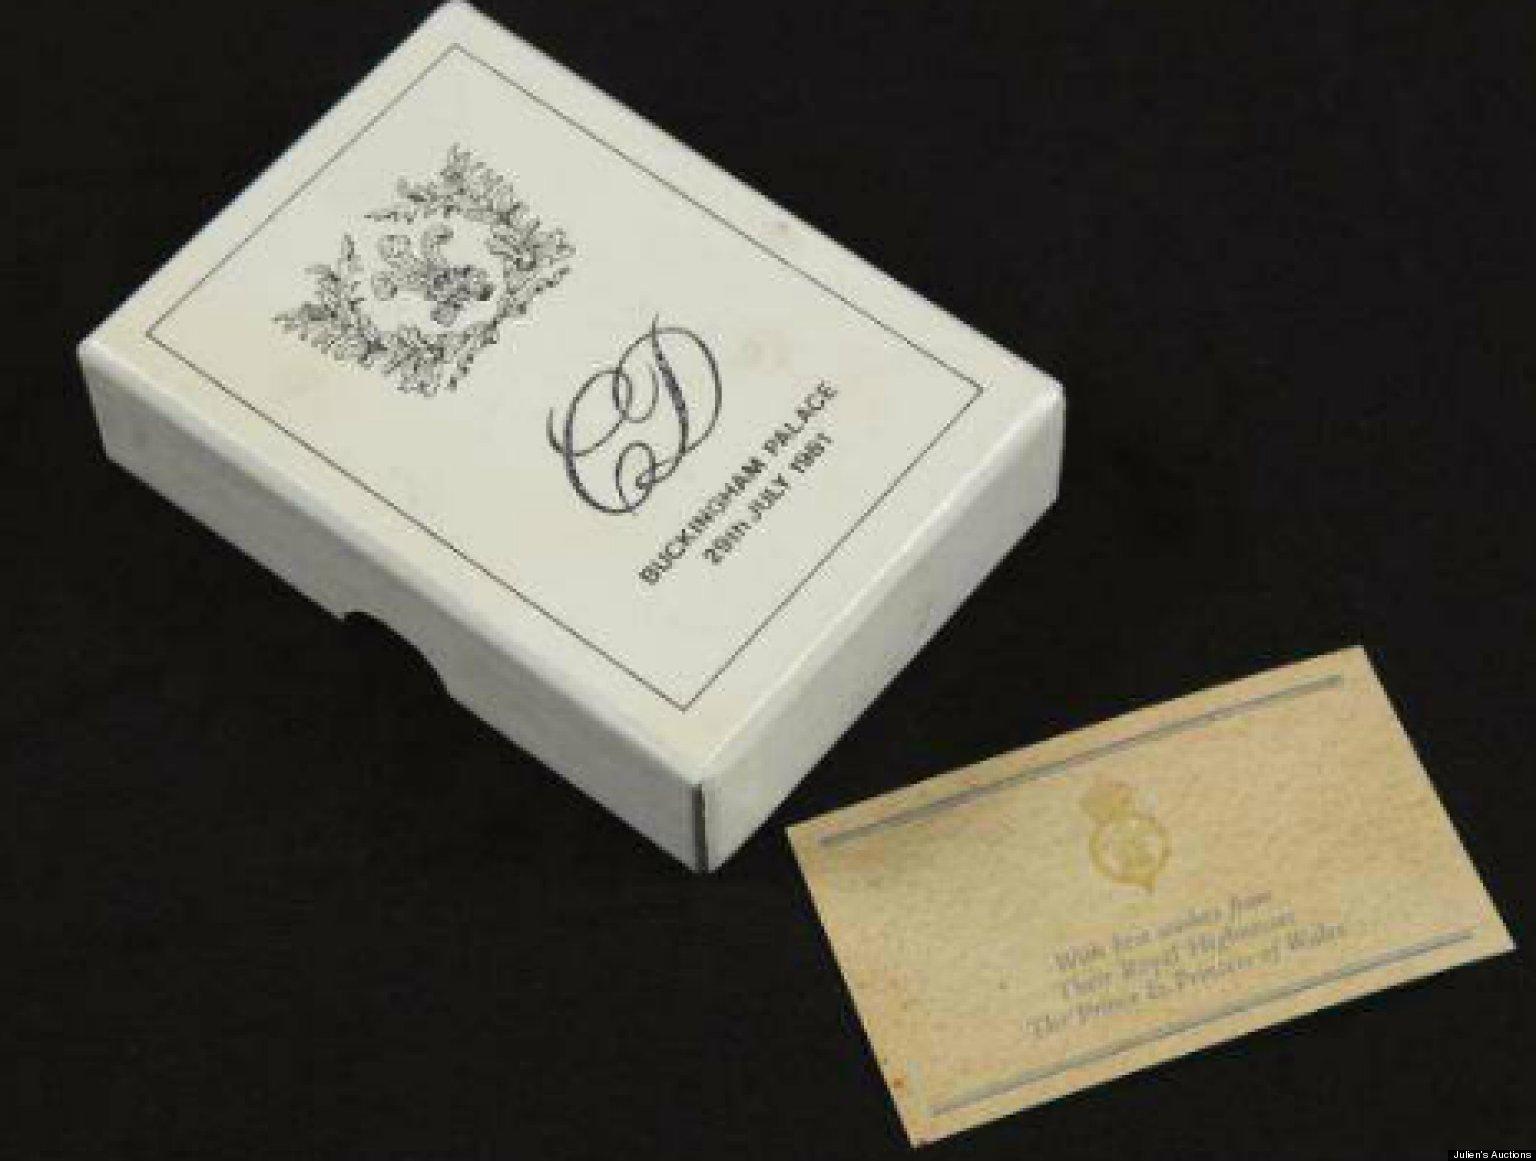 Princess Diana Prince Charles 1981 Wedding Cake Slice Up